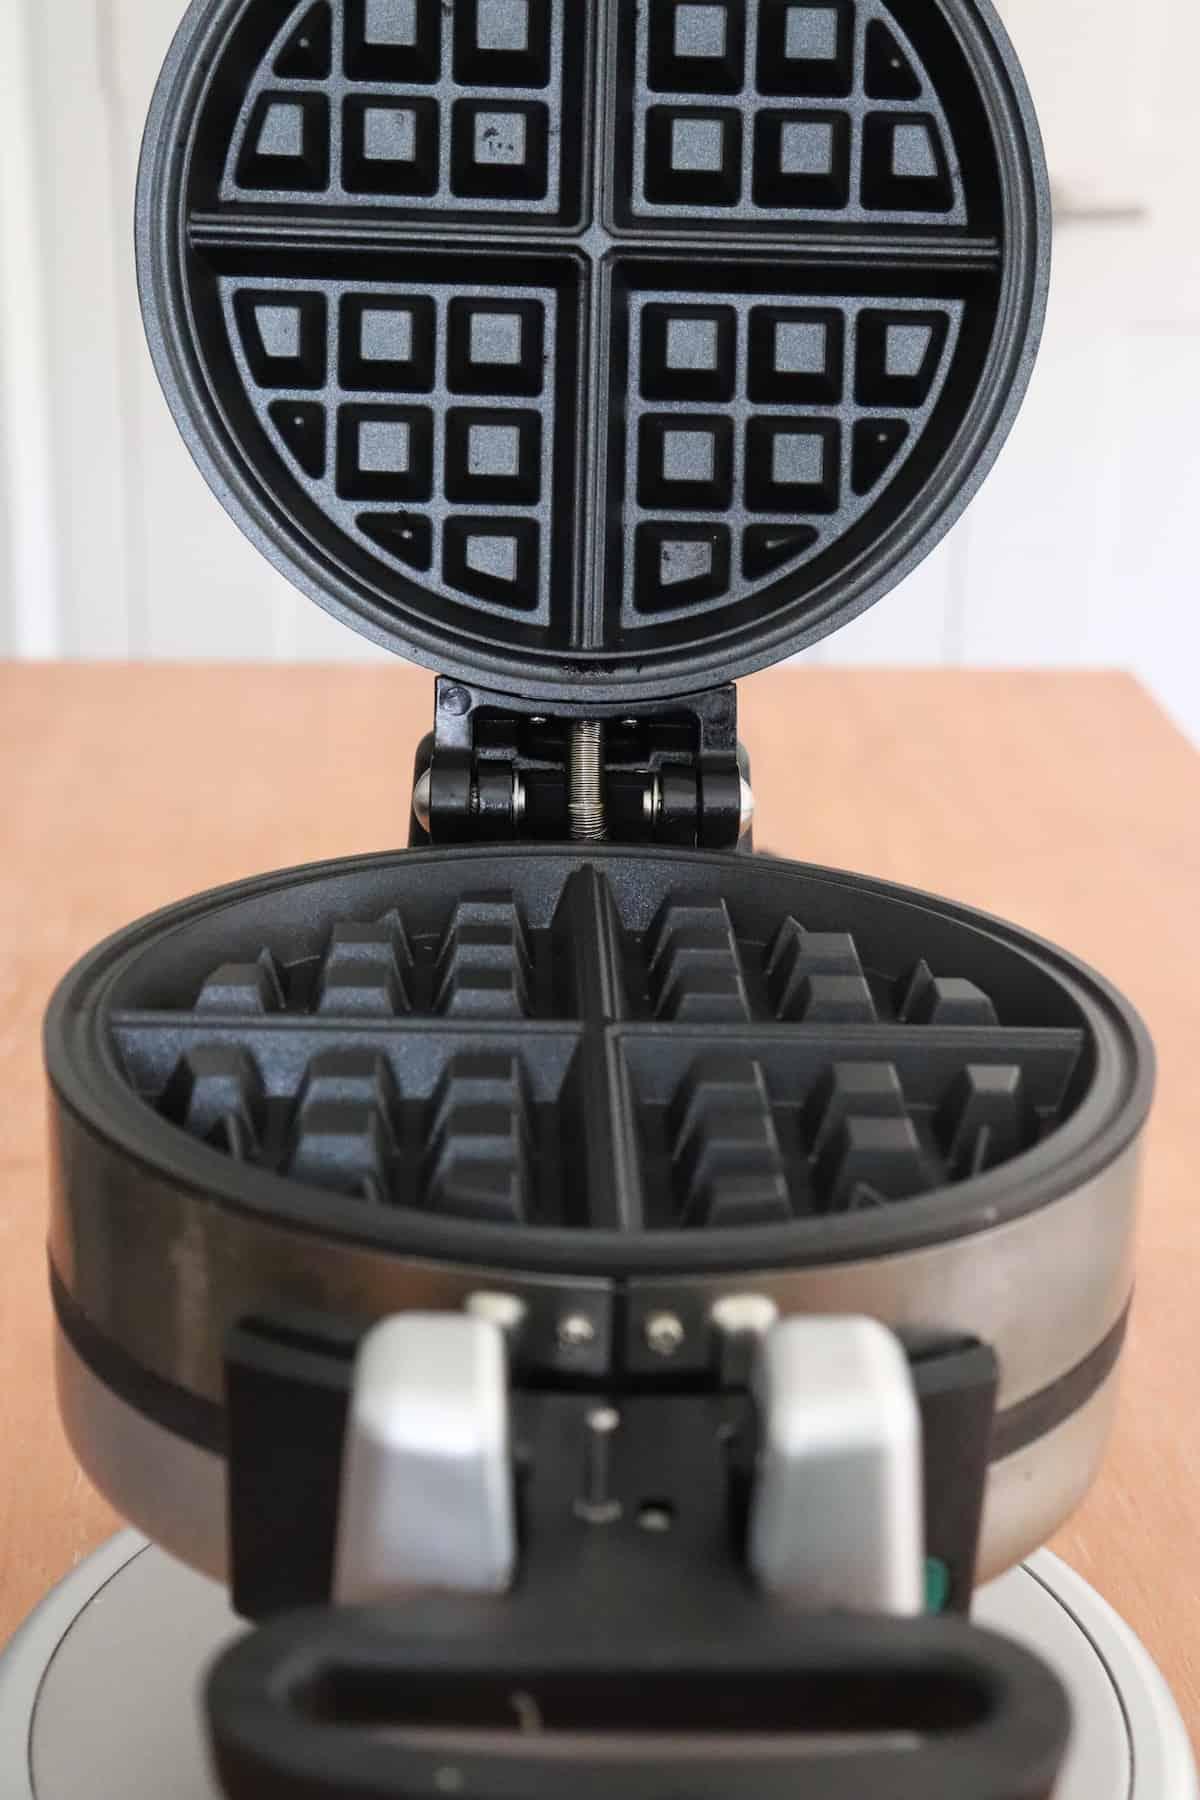 Cuisinart double waffle maker